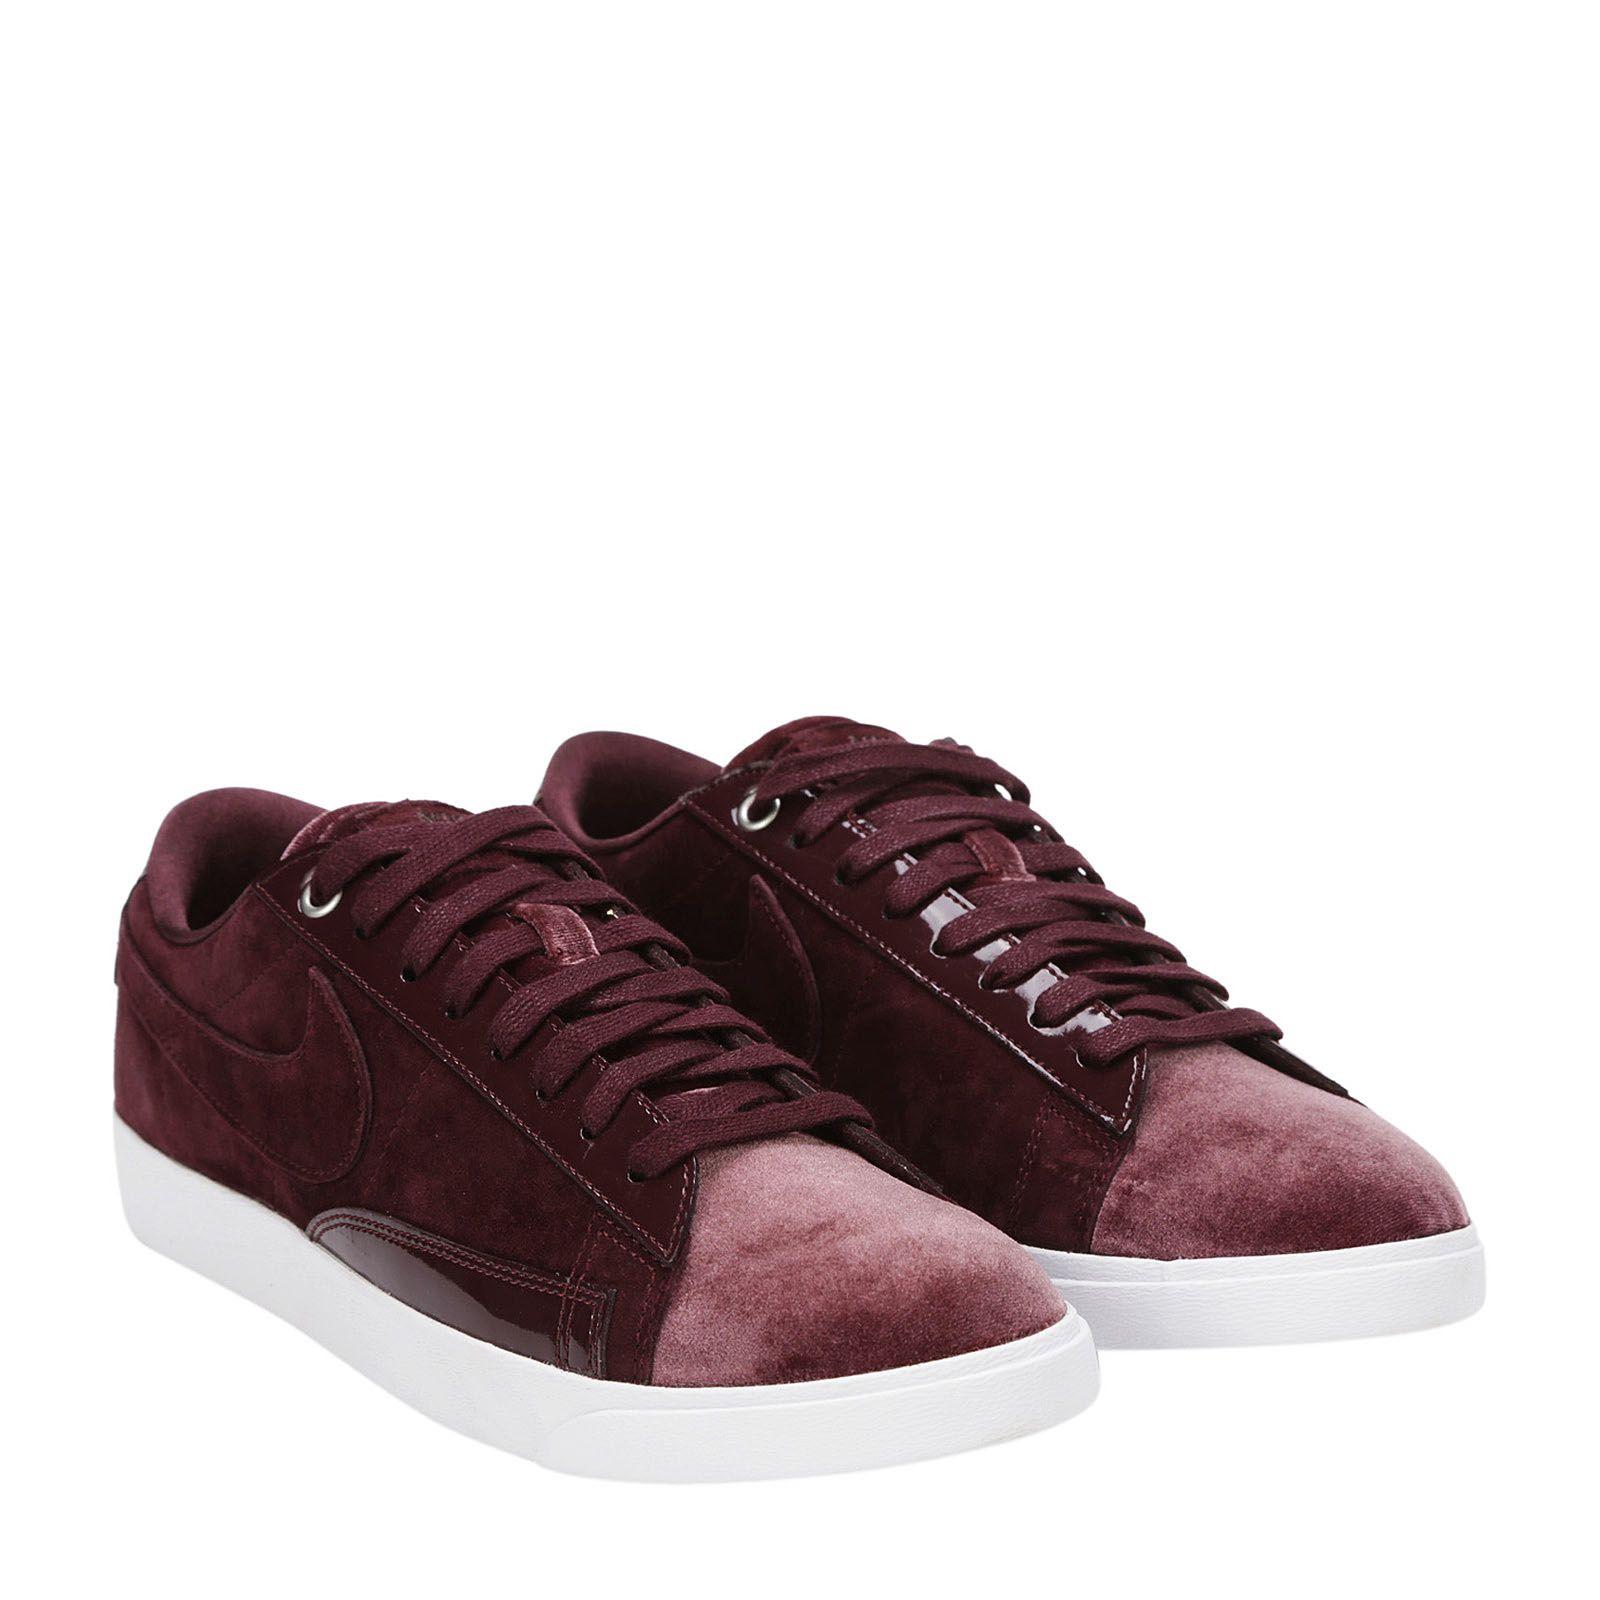 Nike Nikecourt Royale Sneakers